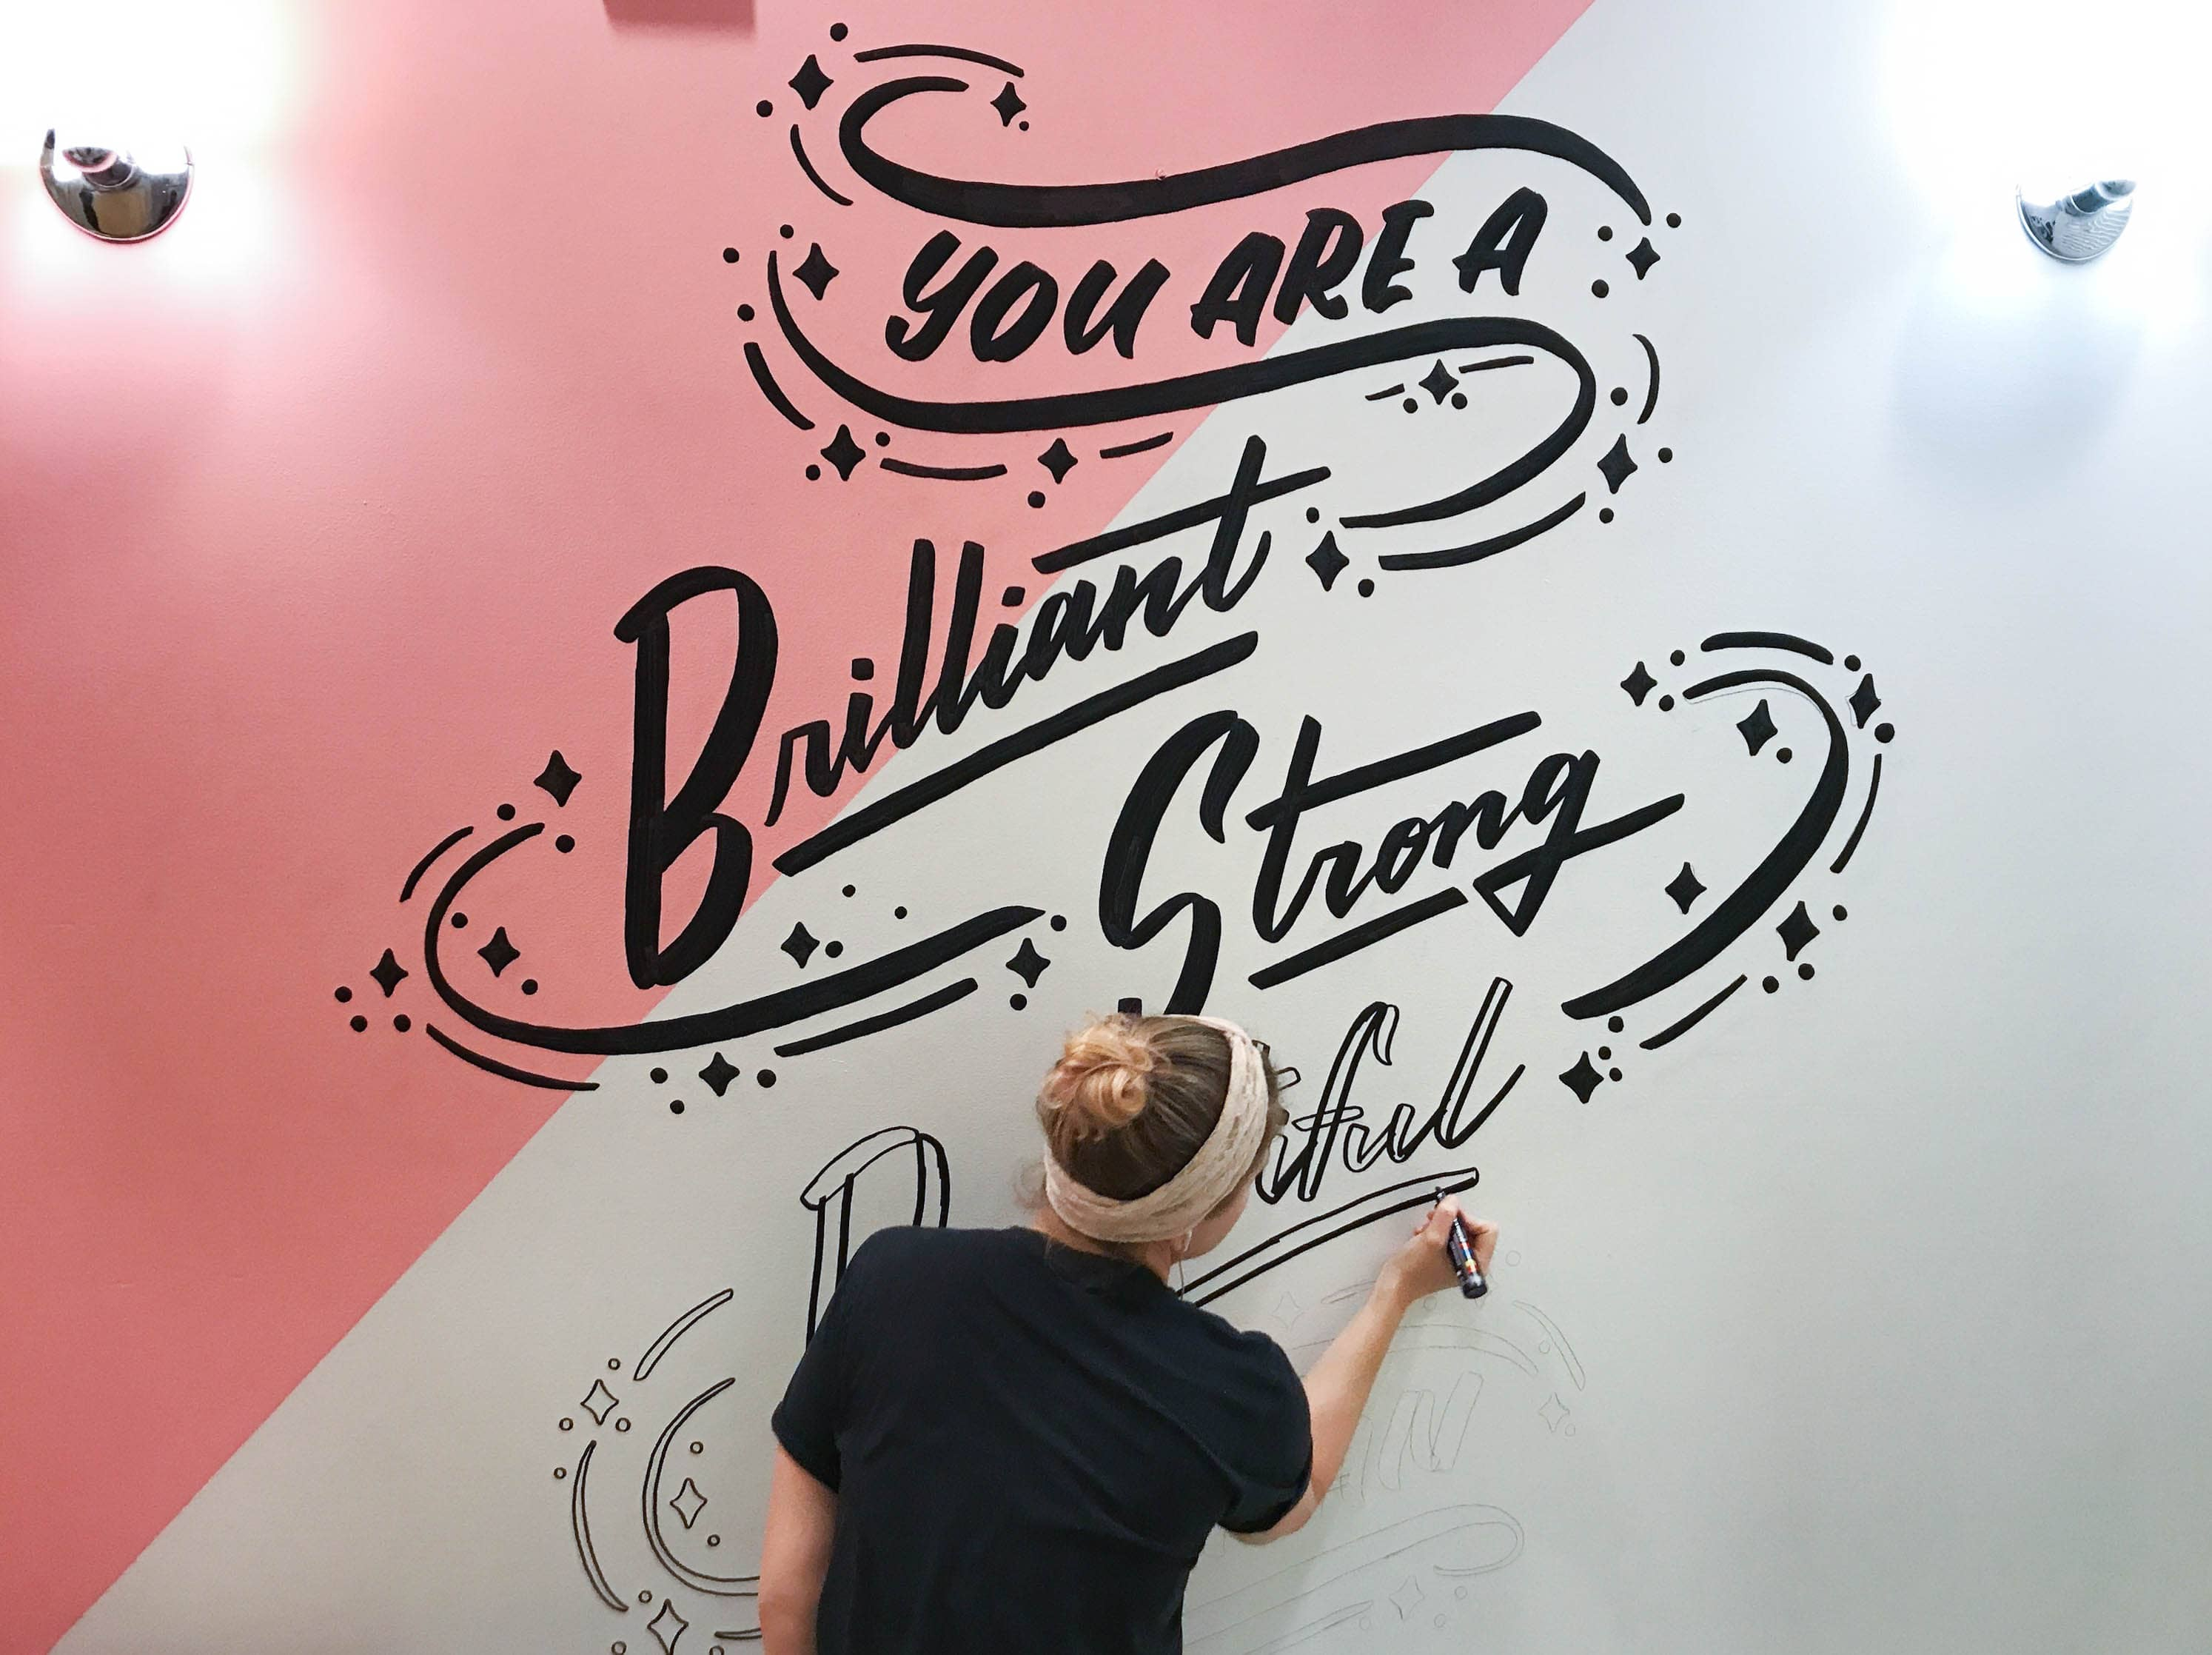 Bloomingdales Fitting Room Mural - Duplicate